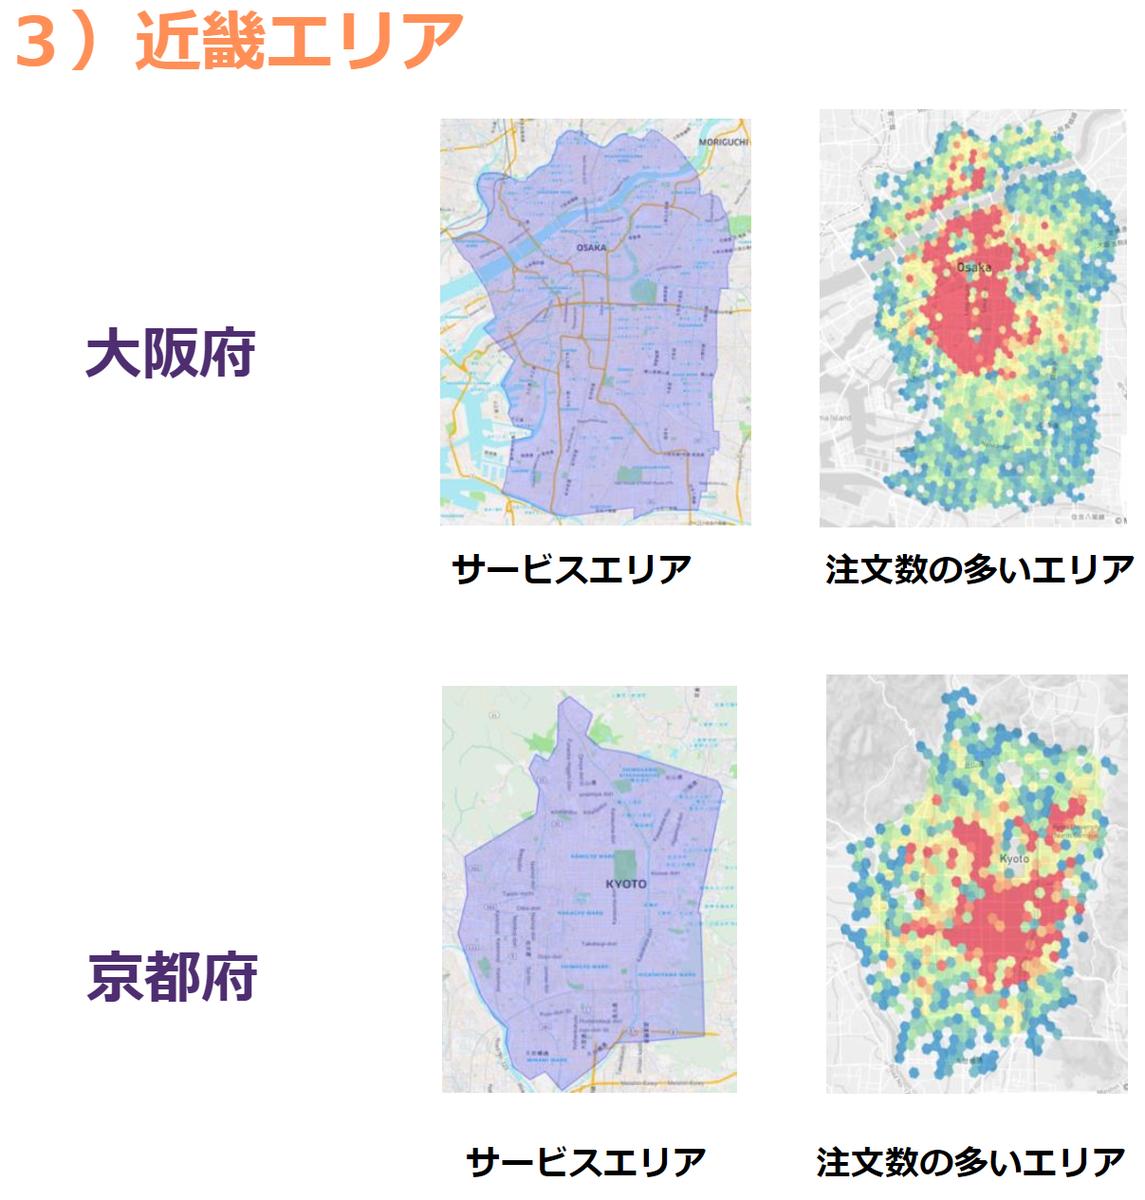 f:id:masaru-tanai:20190919001818p:plain